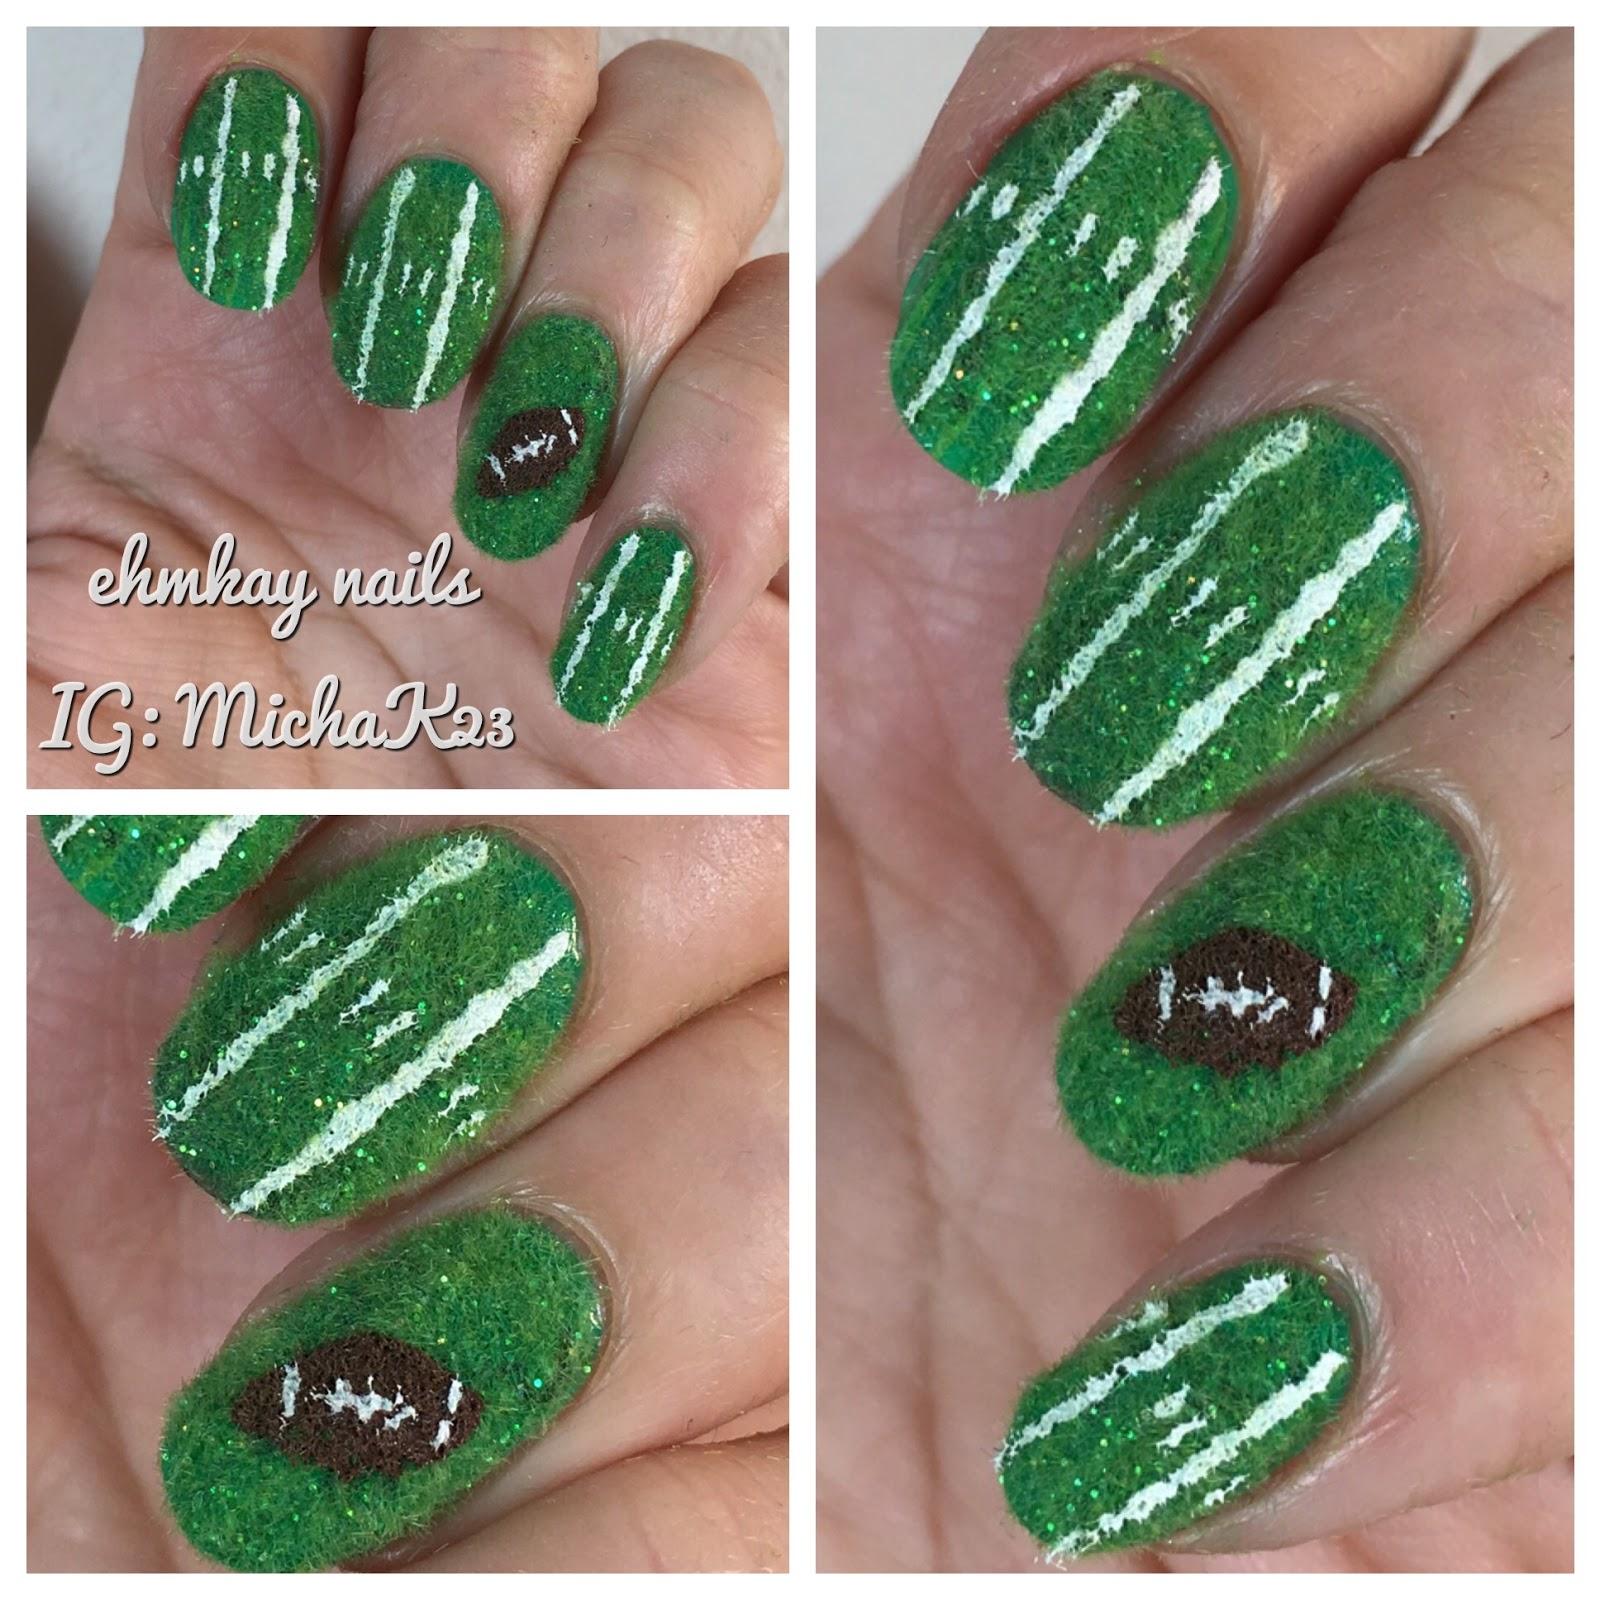 Ehmkay Nails Superbowl Nail Art Astroturf Football Field Art